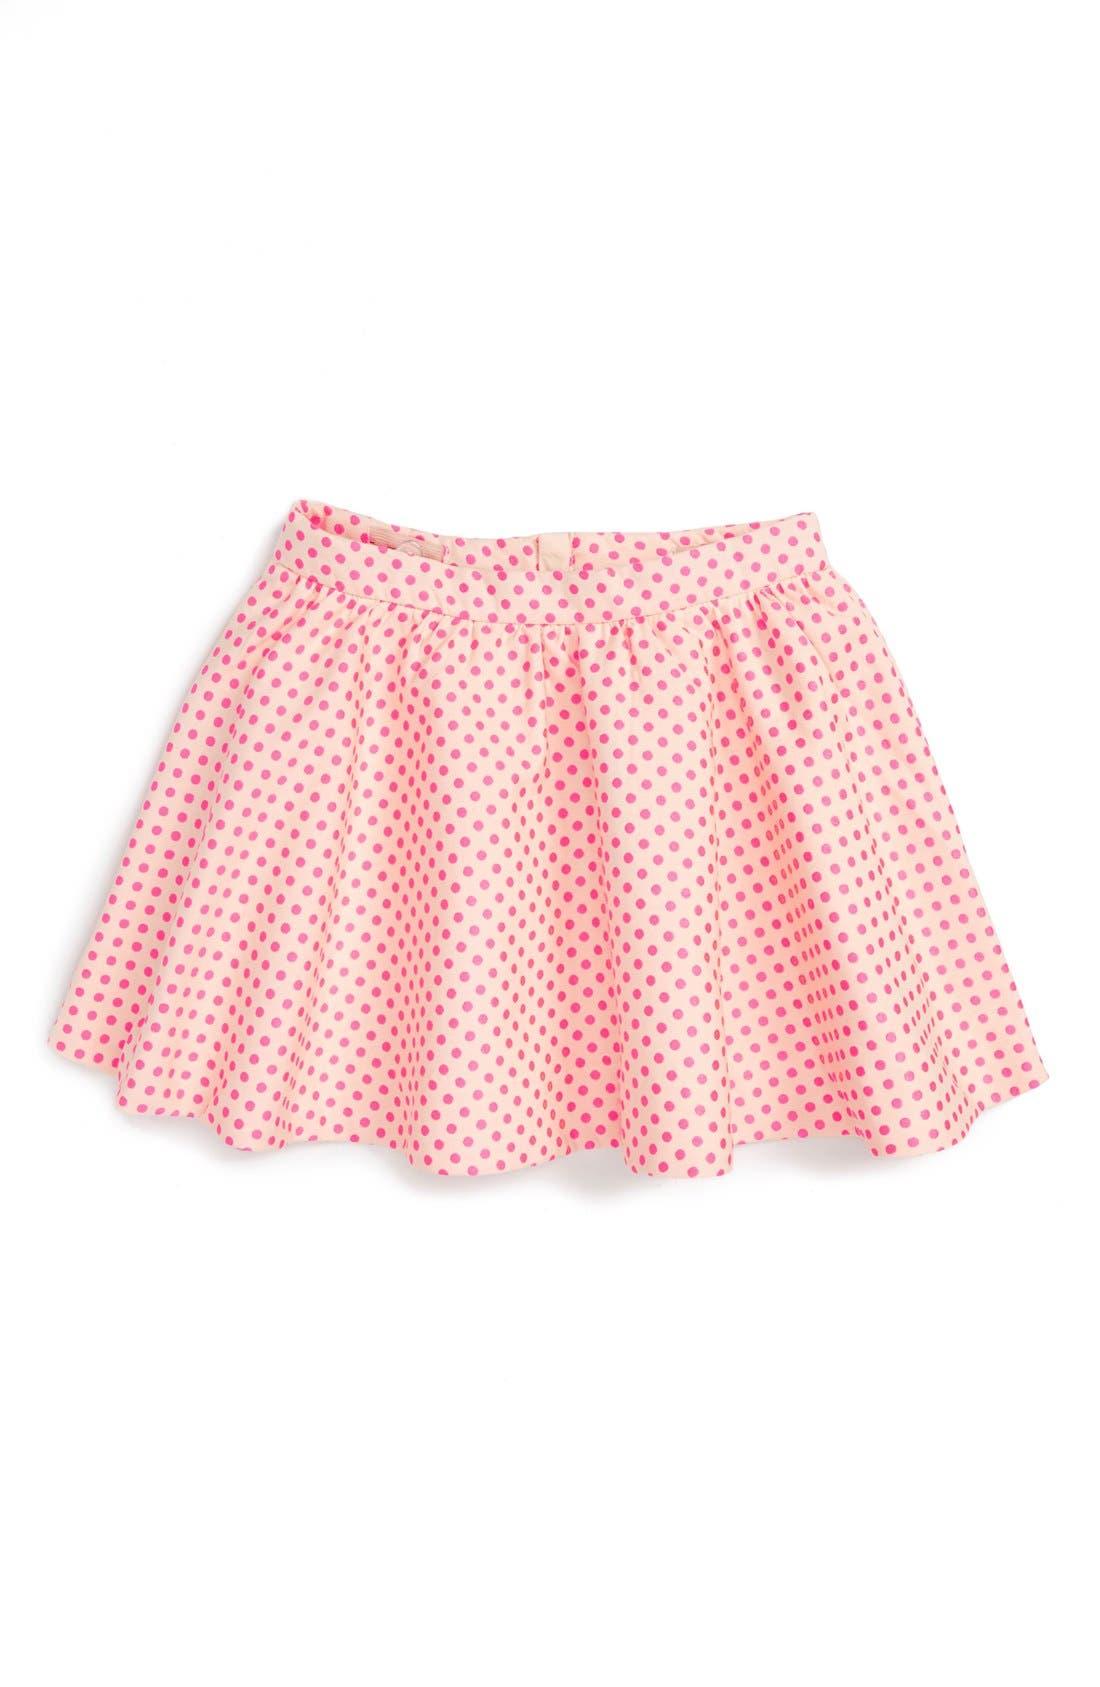 Main Image - kate spade new york 'coreen' dot jacquard skirt (Toddler Girls & Little Girls)